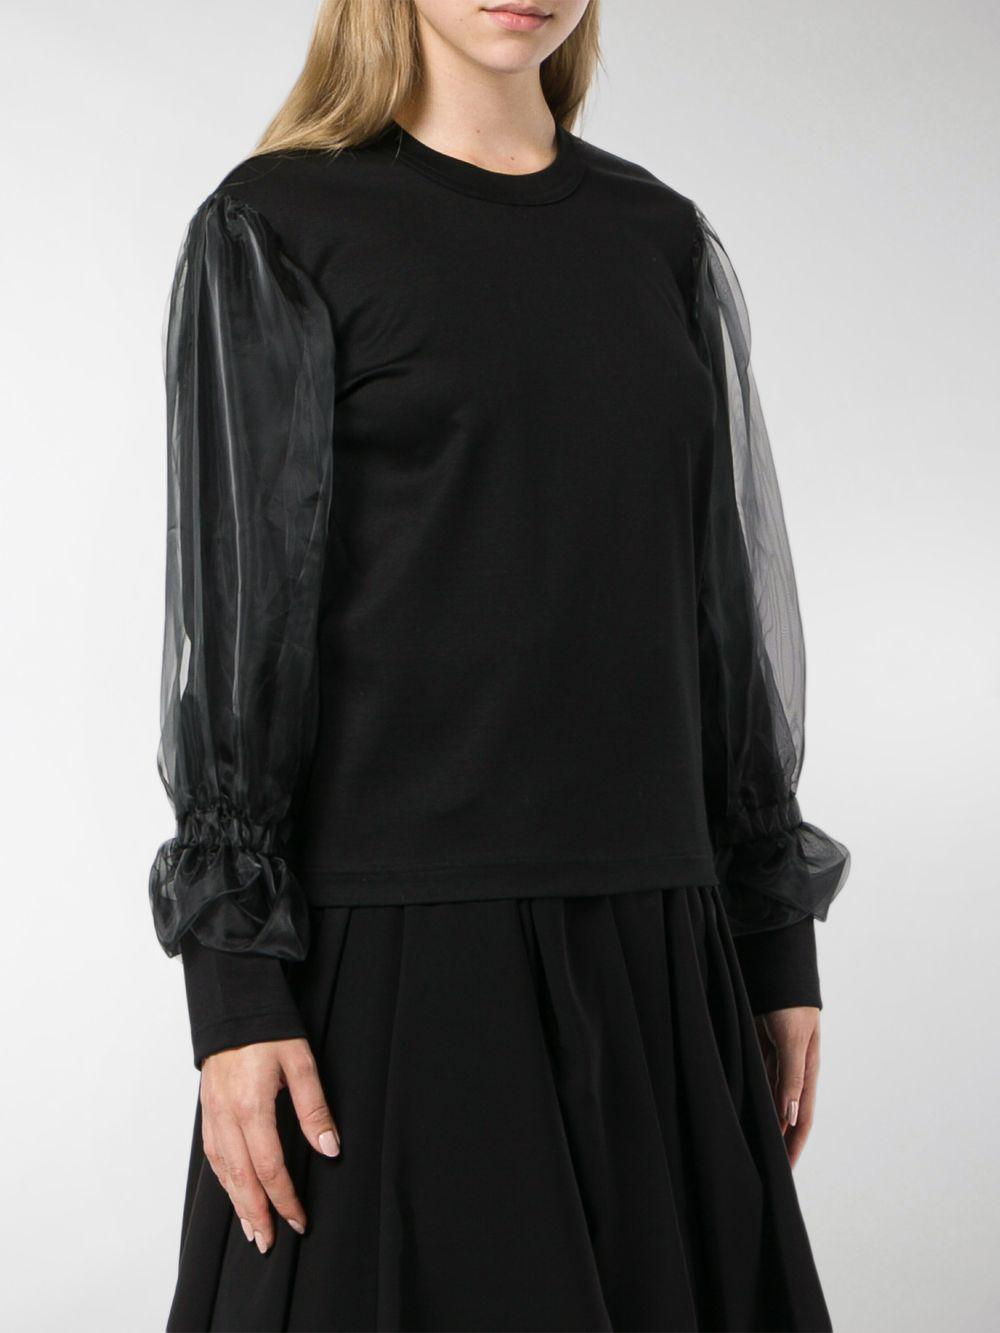 Sweater Comme Garçons Black Des Lyst Tulle Insert In SZCxqP